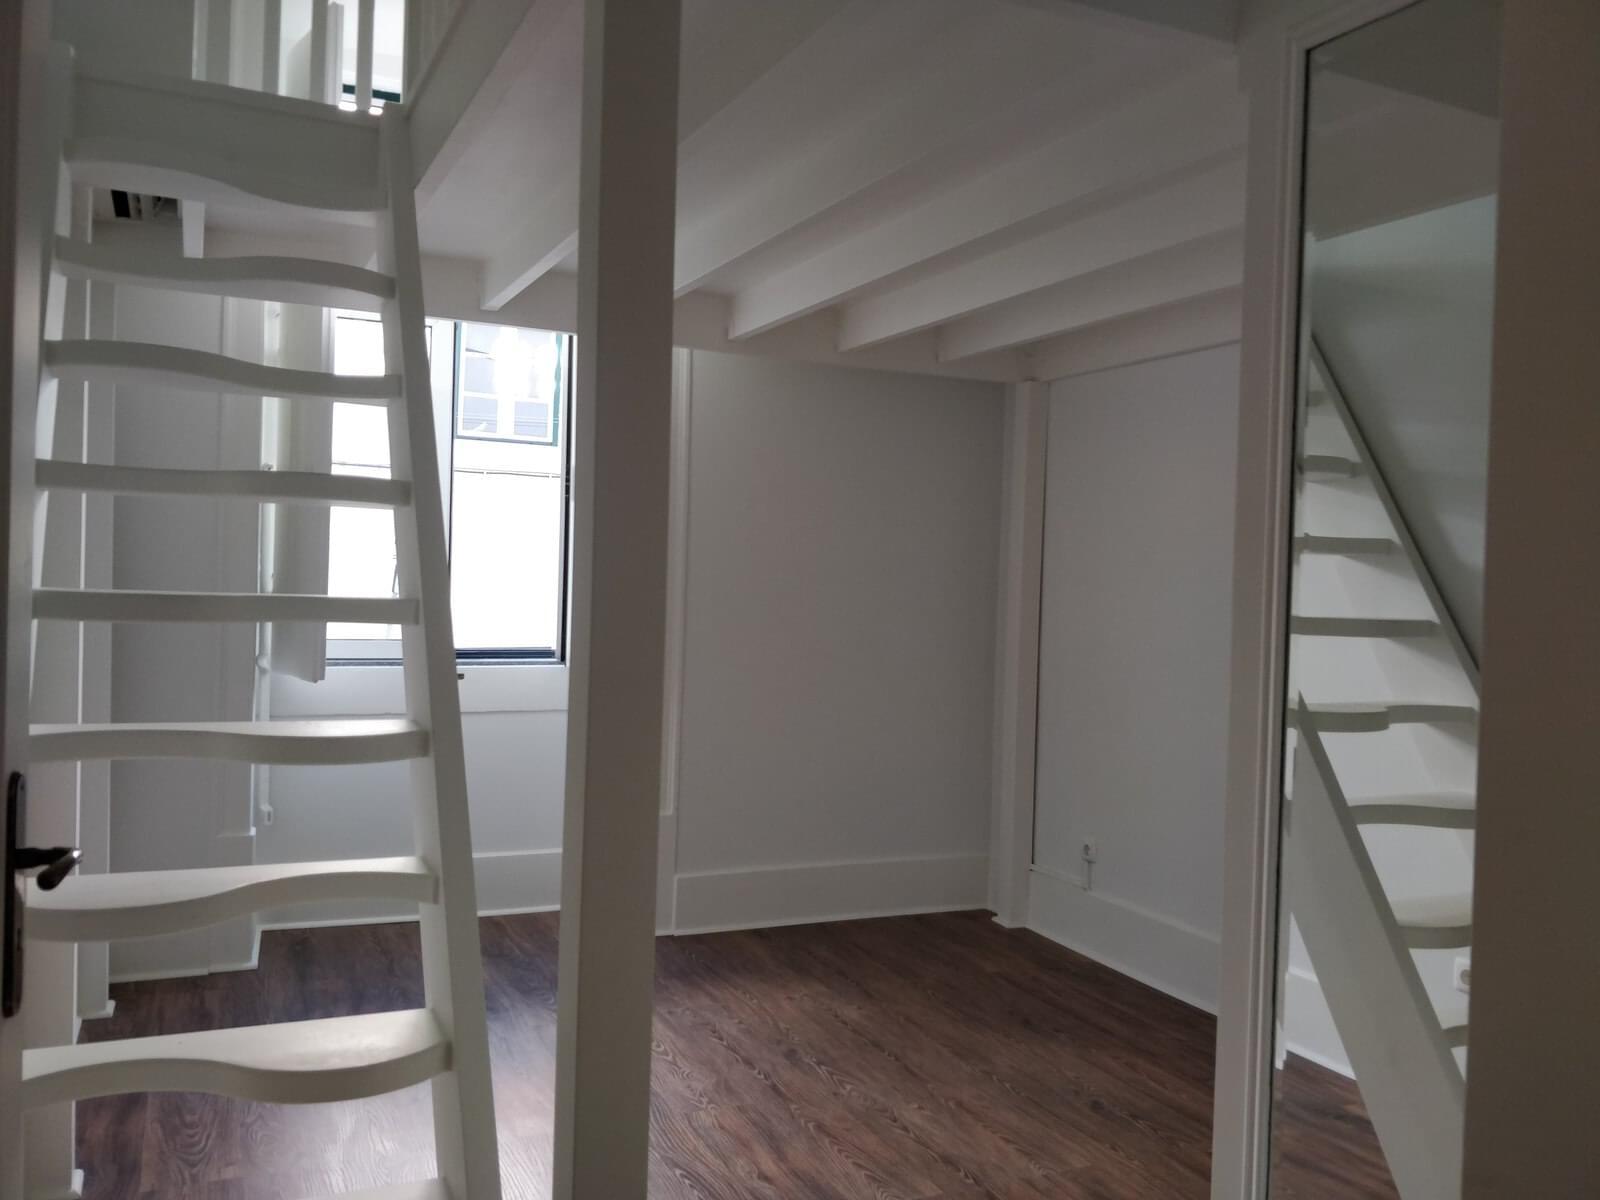 PF16910, Apartamento T3 + 1, Lisboa